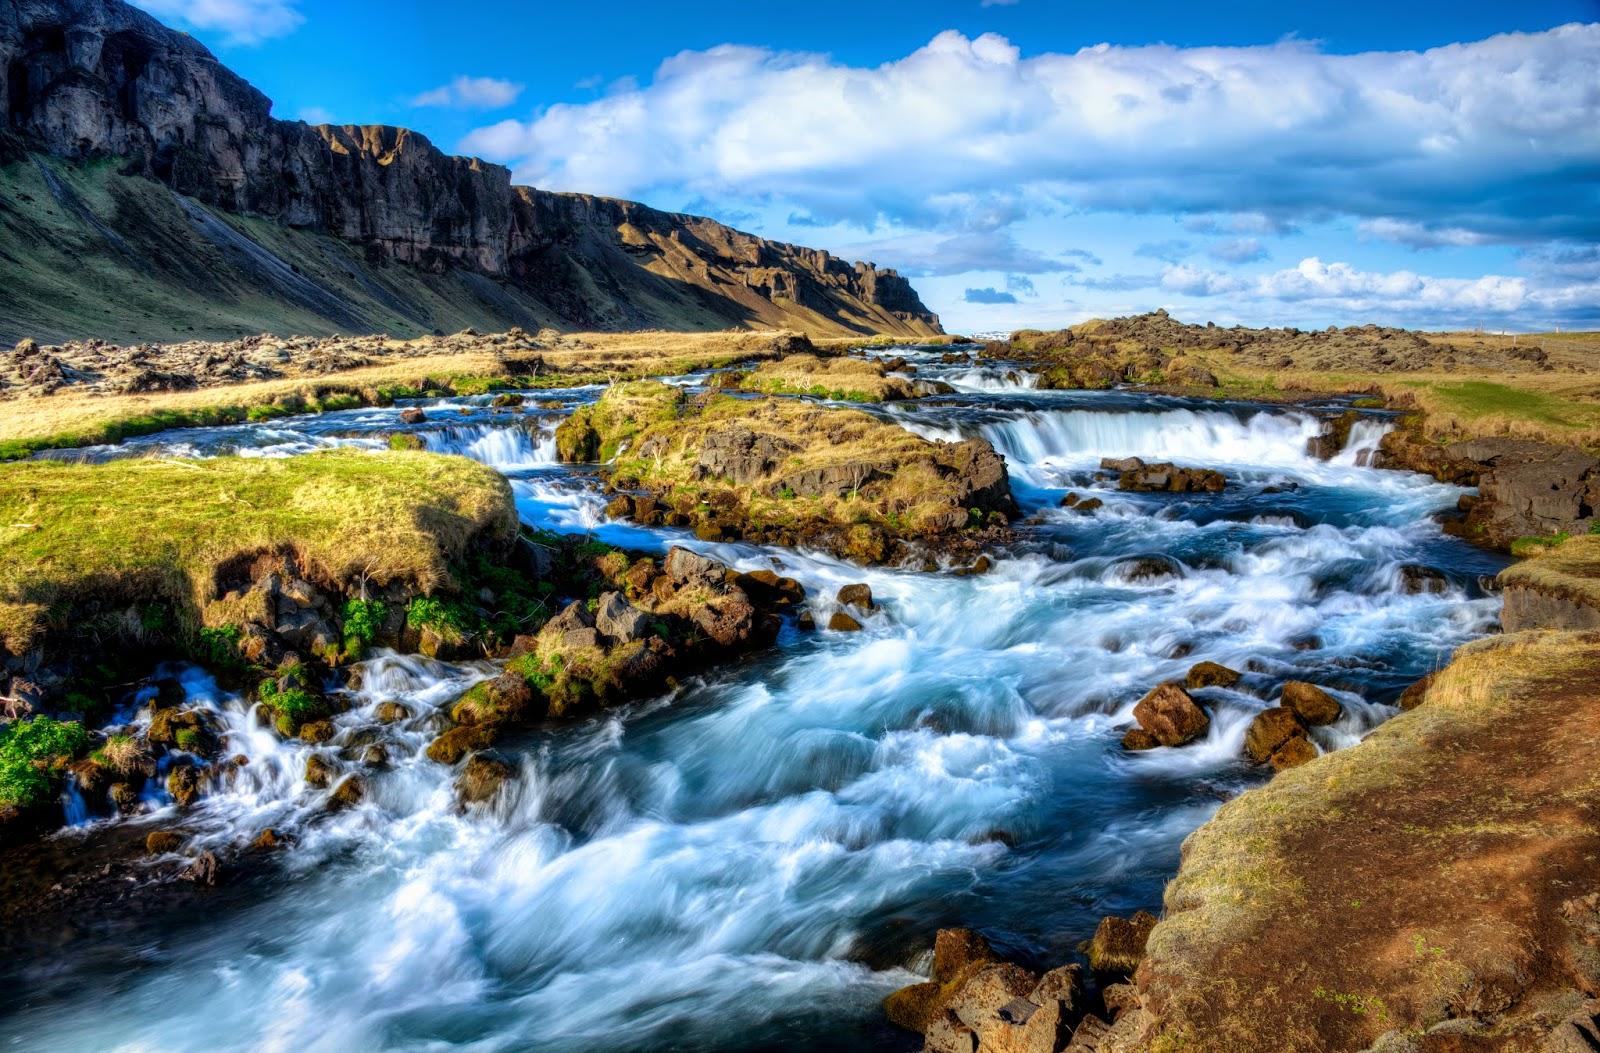 http://wirtagraphy.smugmug.com/FineArt/Iceland/27229866_BJmHf7#!i=3301169937&k=p5wDKRj